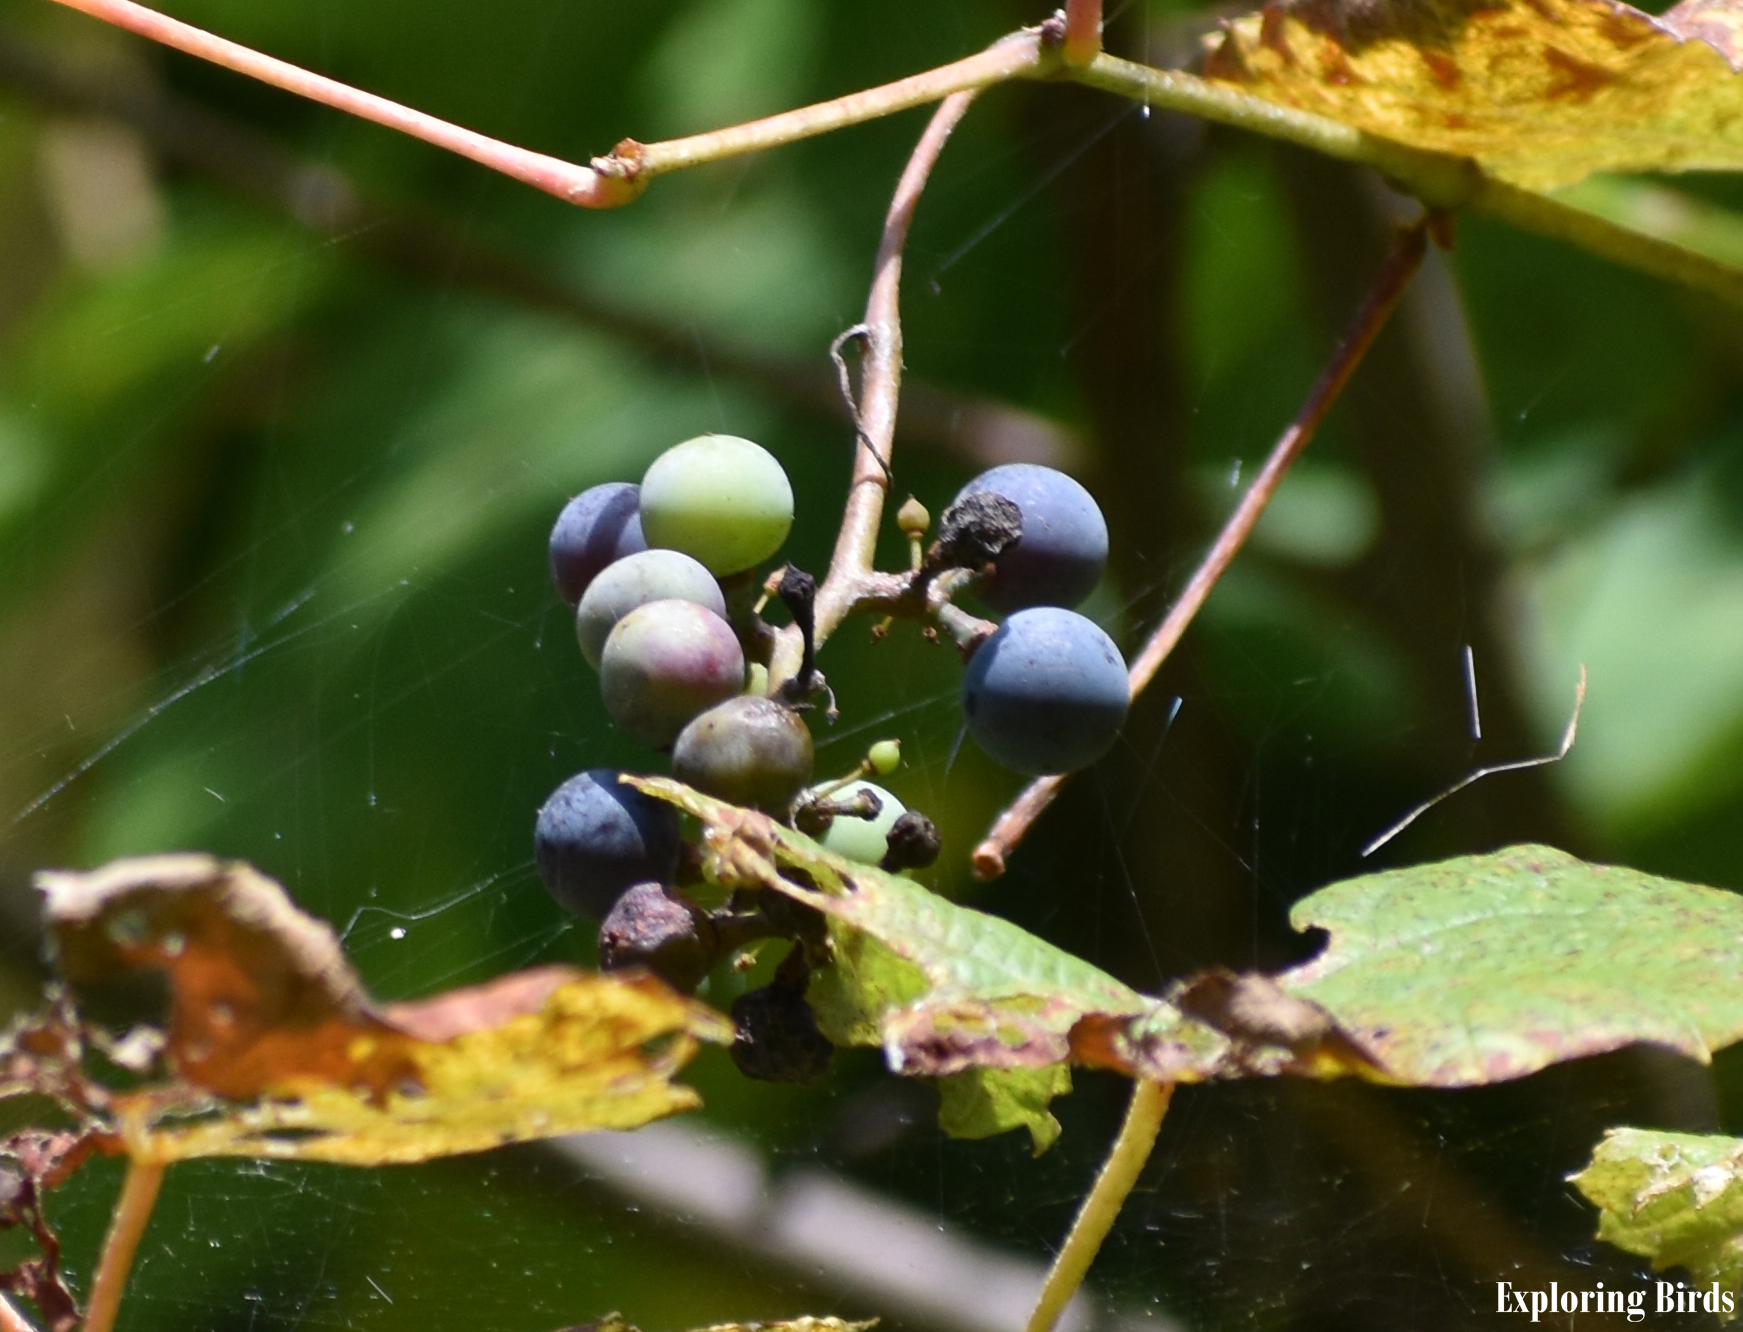 Fox Grape identification